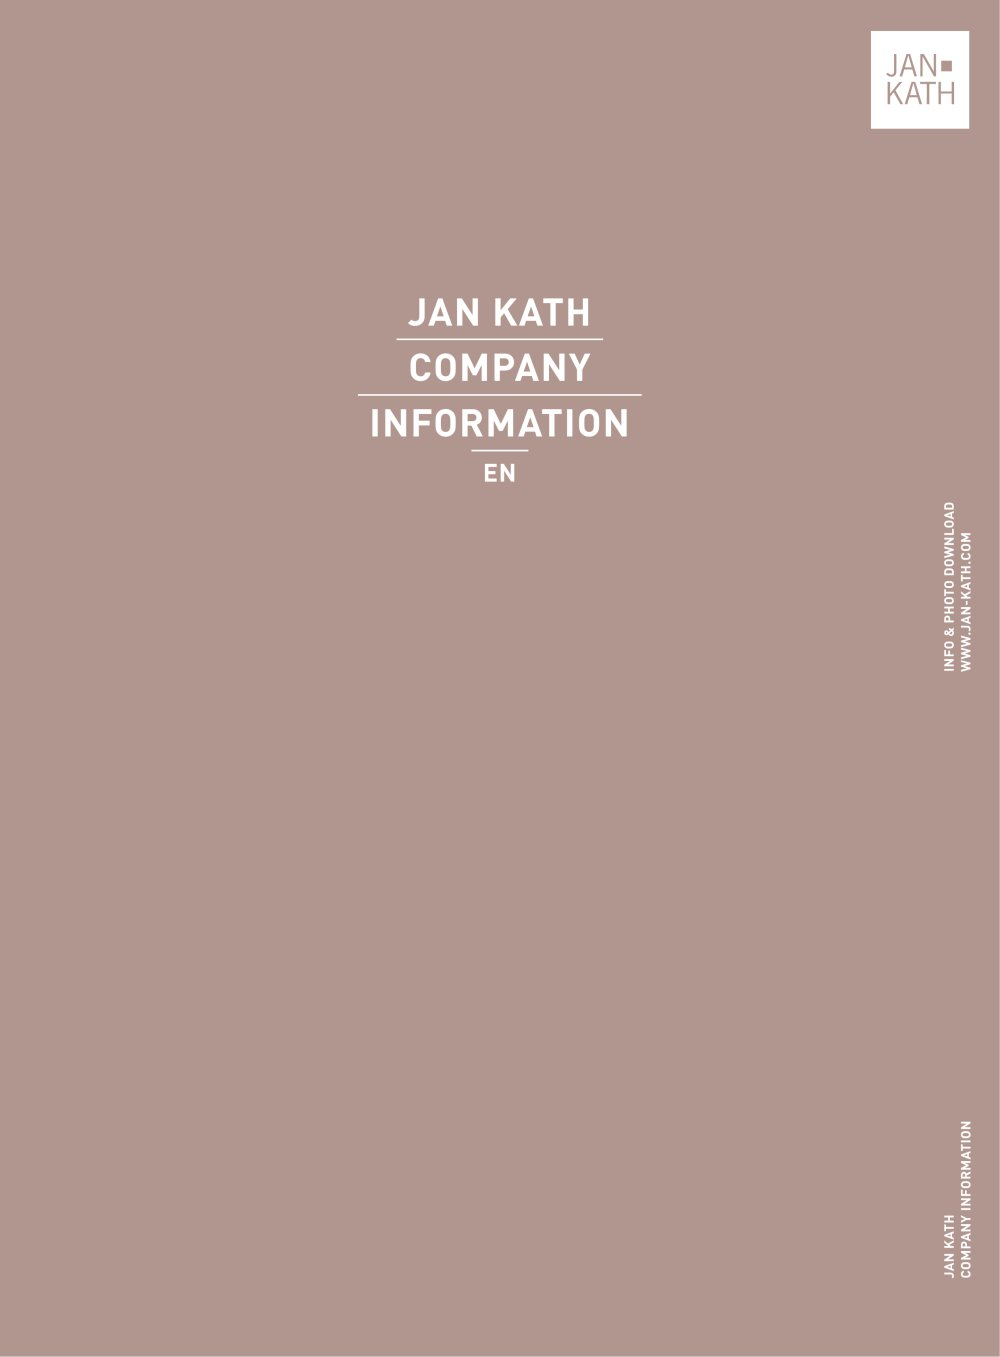 Jan Kath Köln company information jan kath contemporary rug pdf